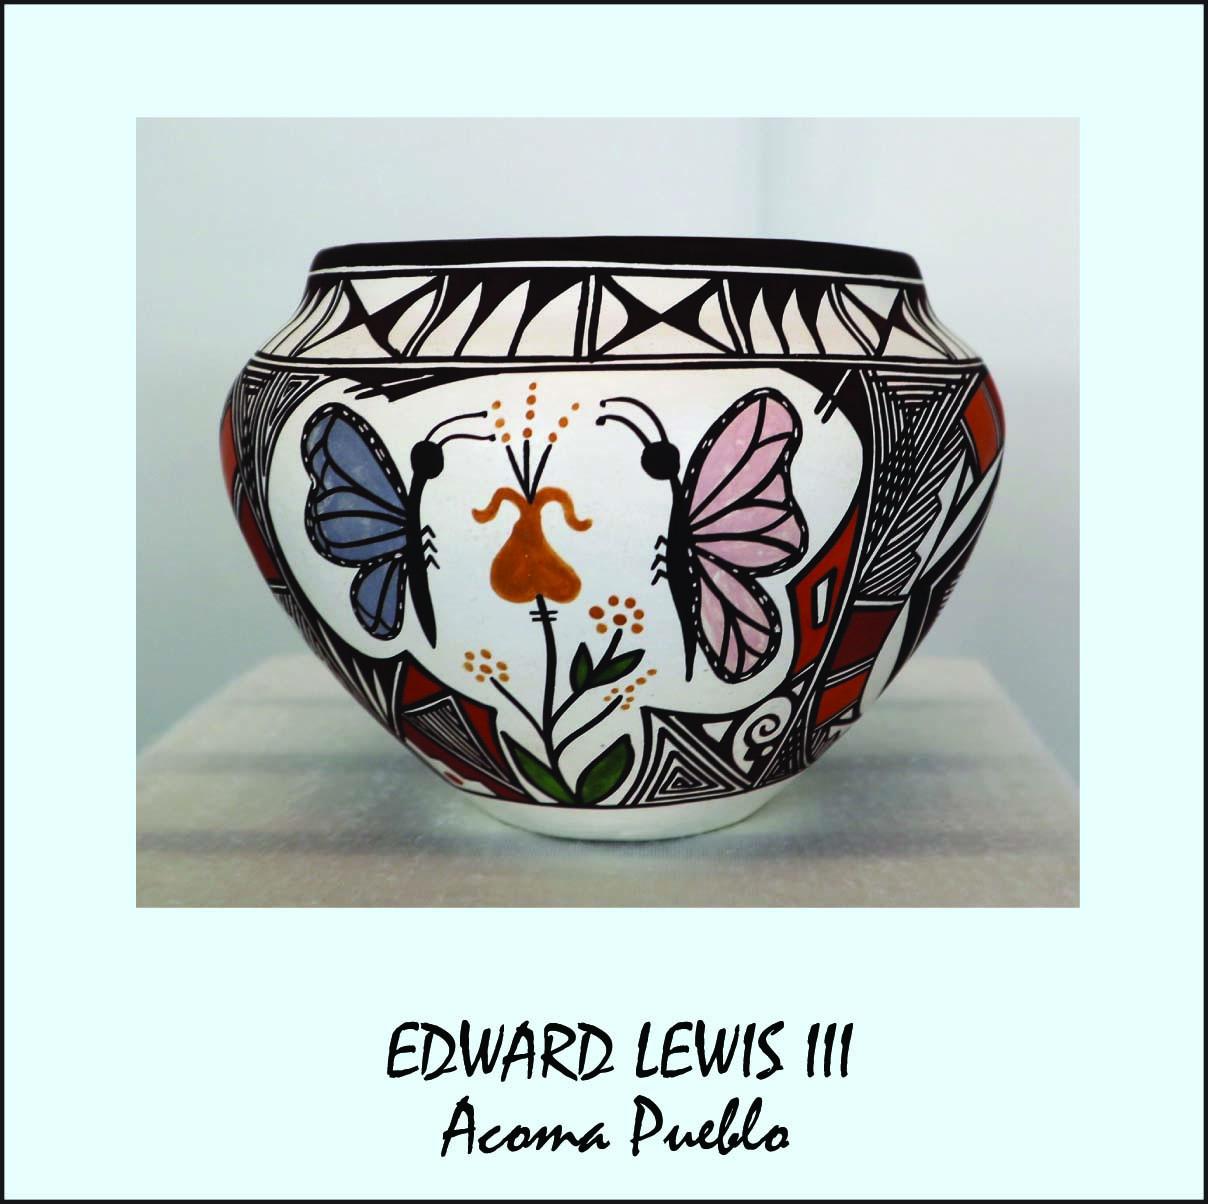 Edward Lewis III